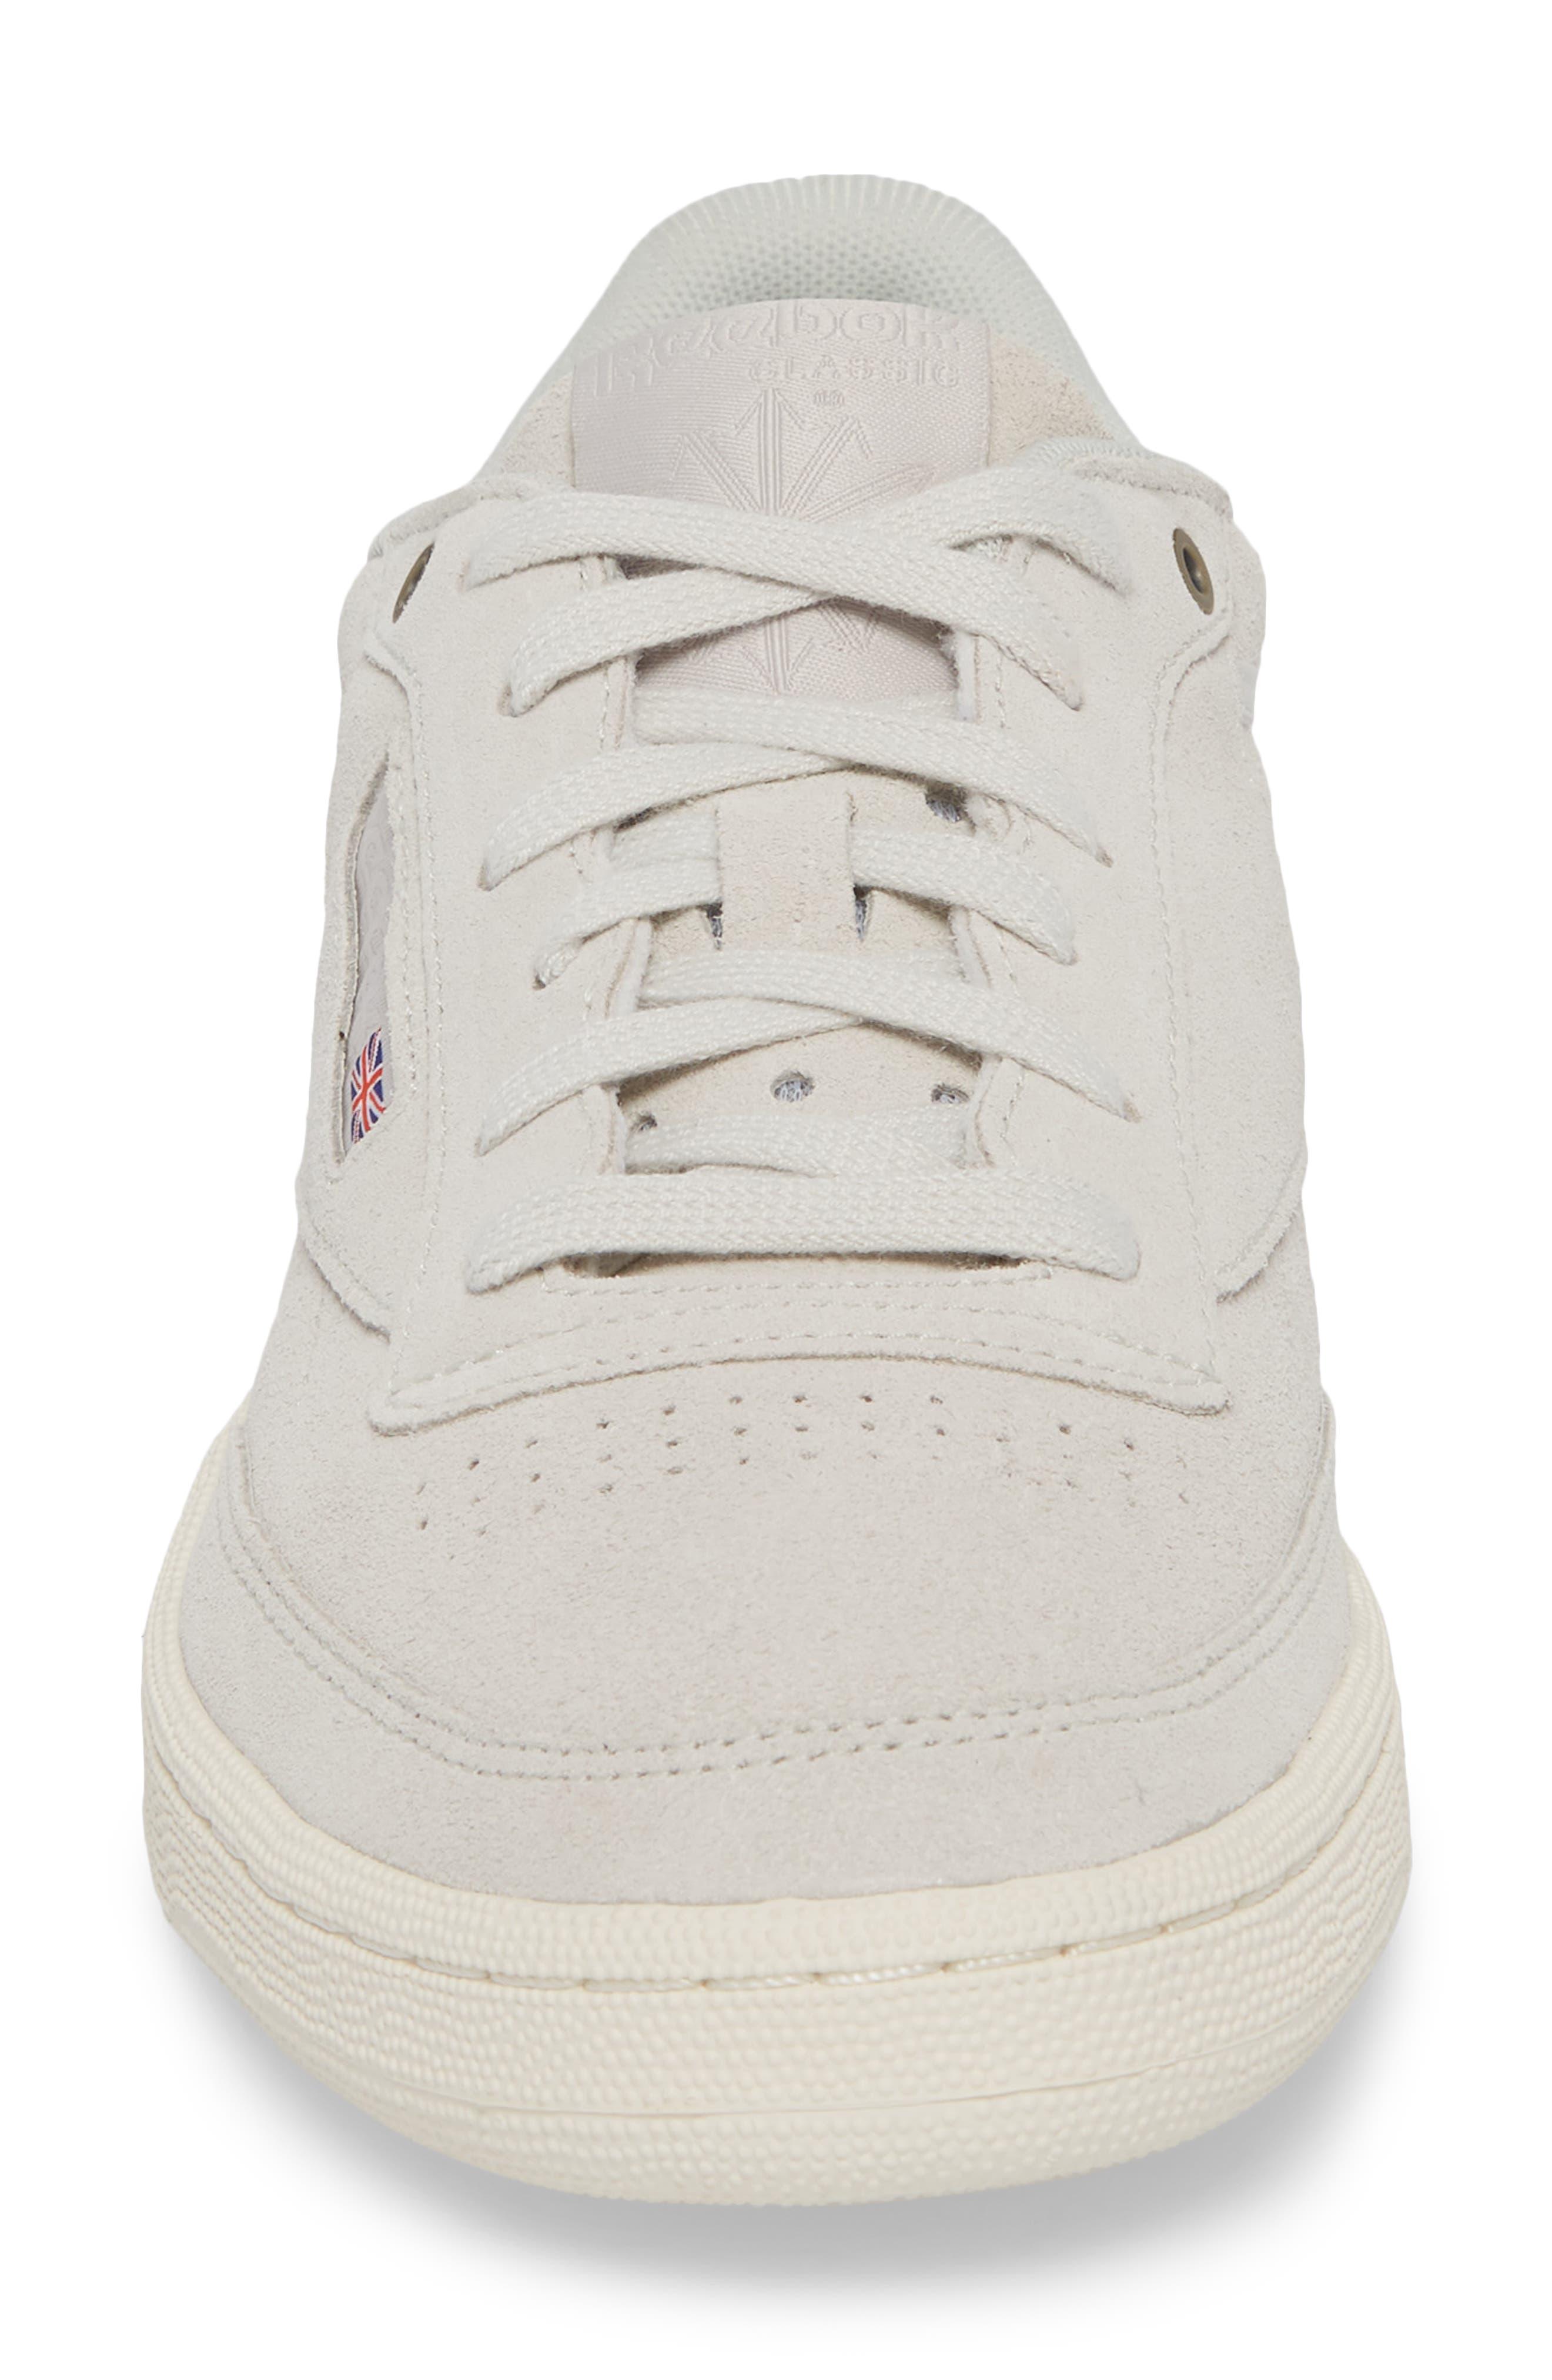 Club C 85 MCC Sneaker,                             Alternate thumbnail 4, color,                             020